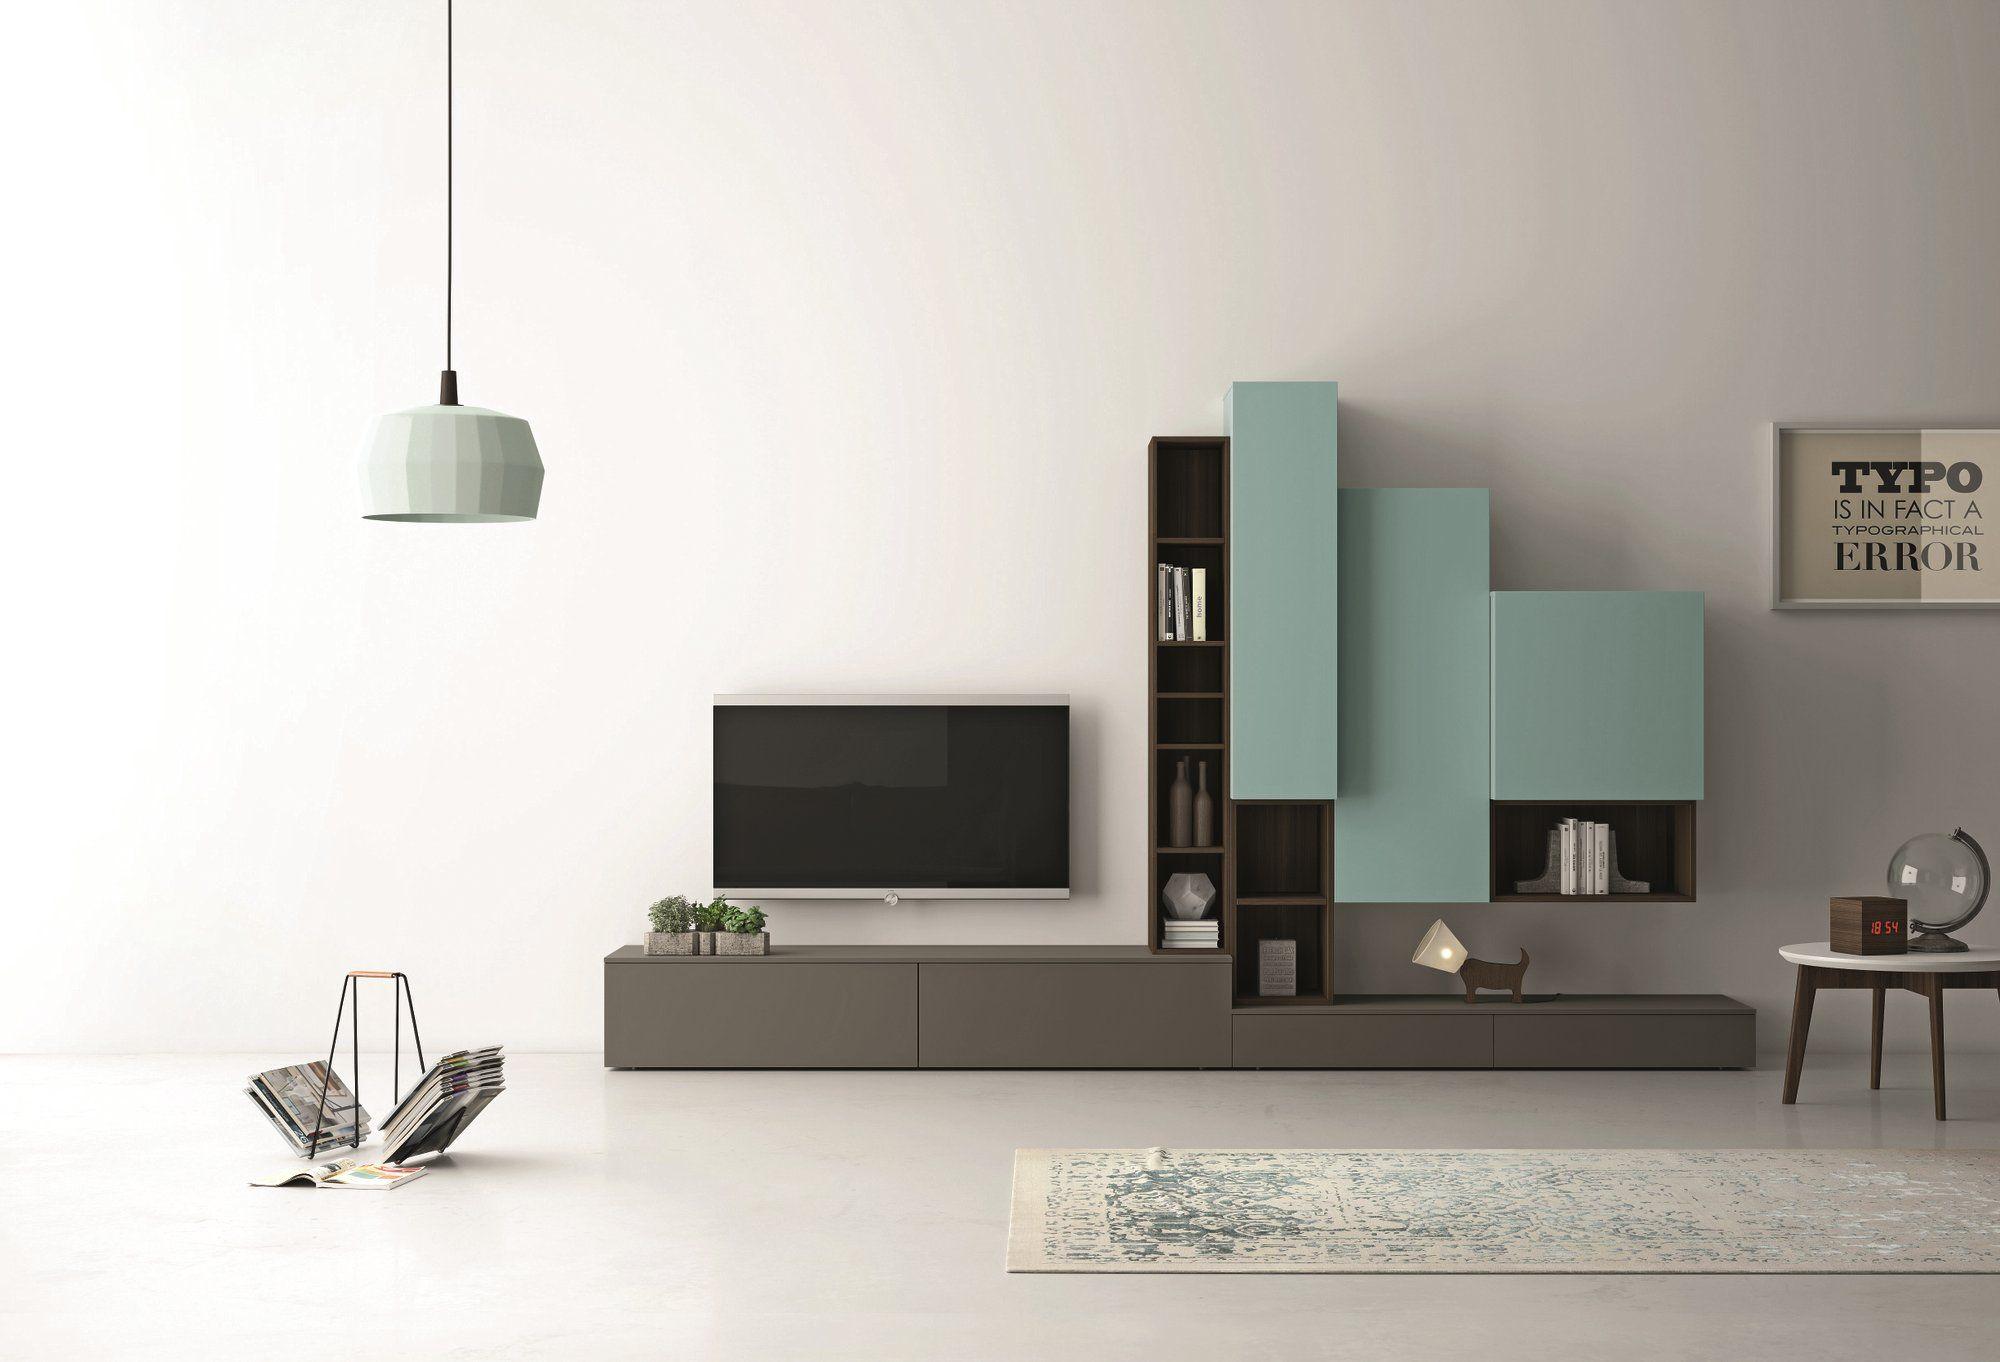 Anbau lackierte tv wohnwand slim 87 by dall agnese for Tv wohnwand design